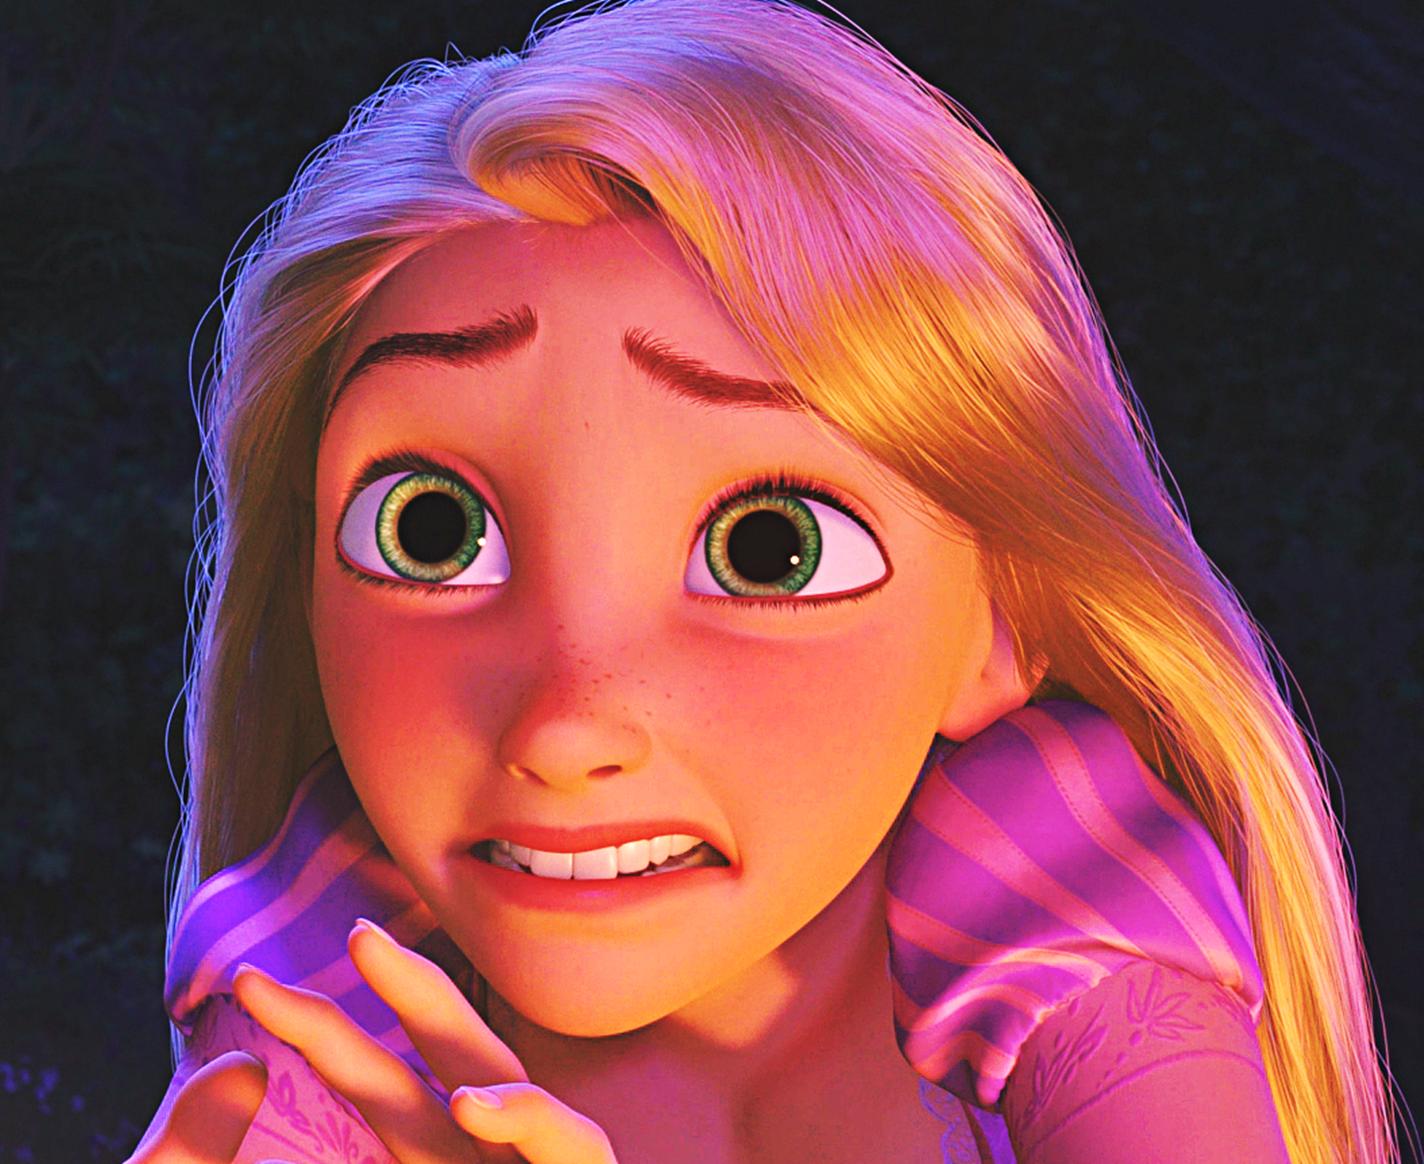 Walt disney - Princess Rapunzel